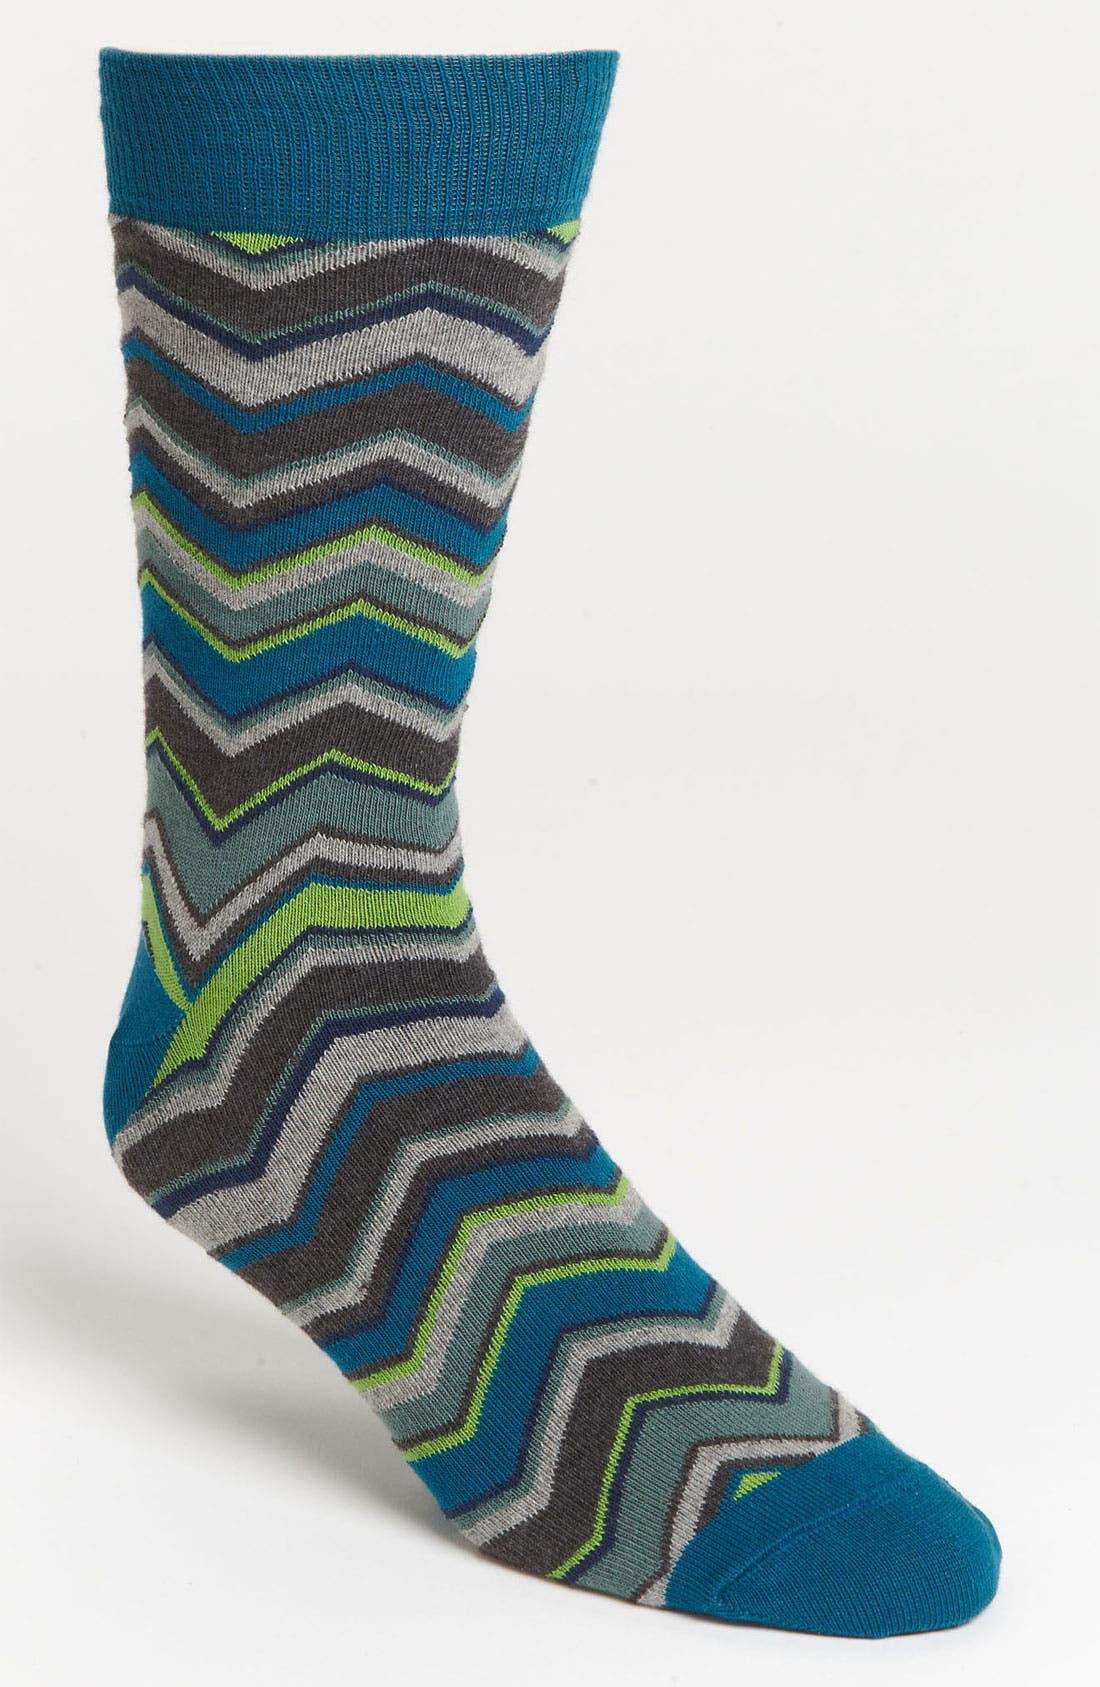 Main Image - Pact Zigzag Socks